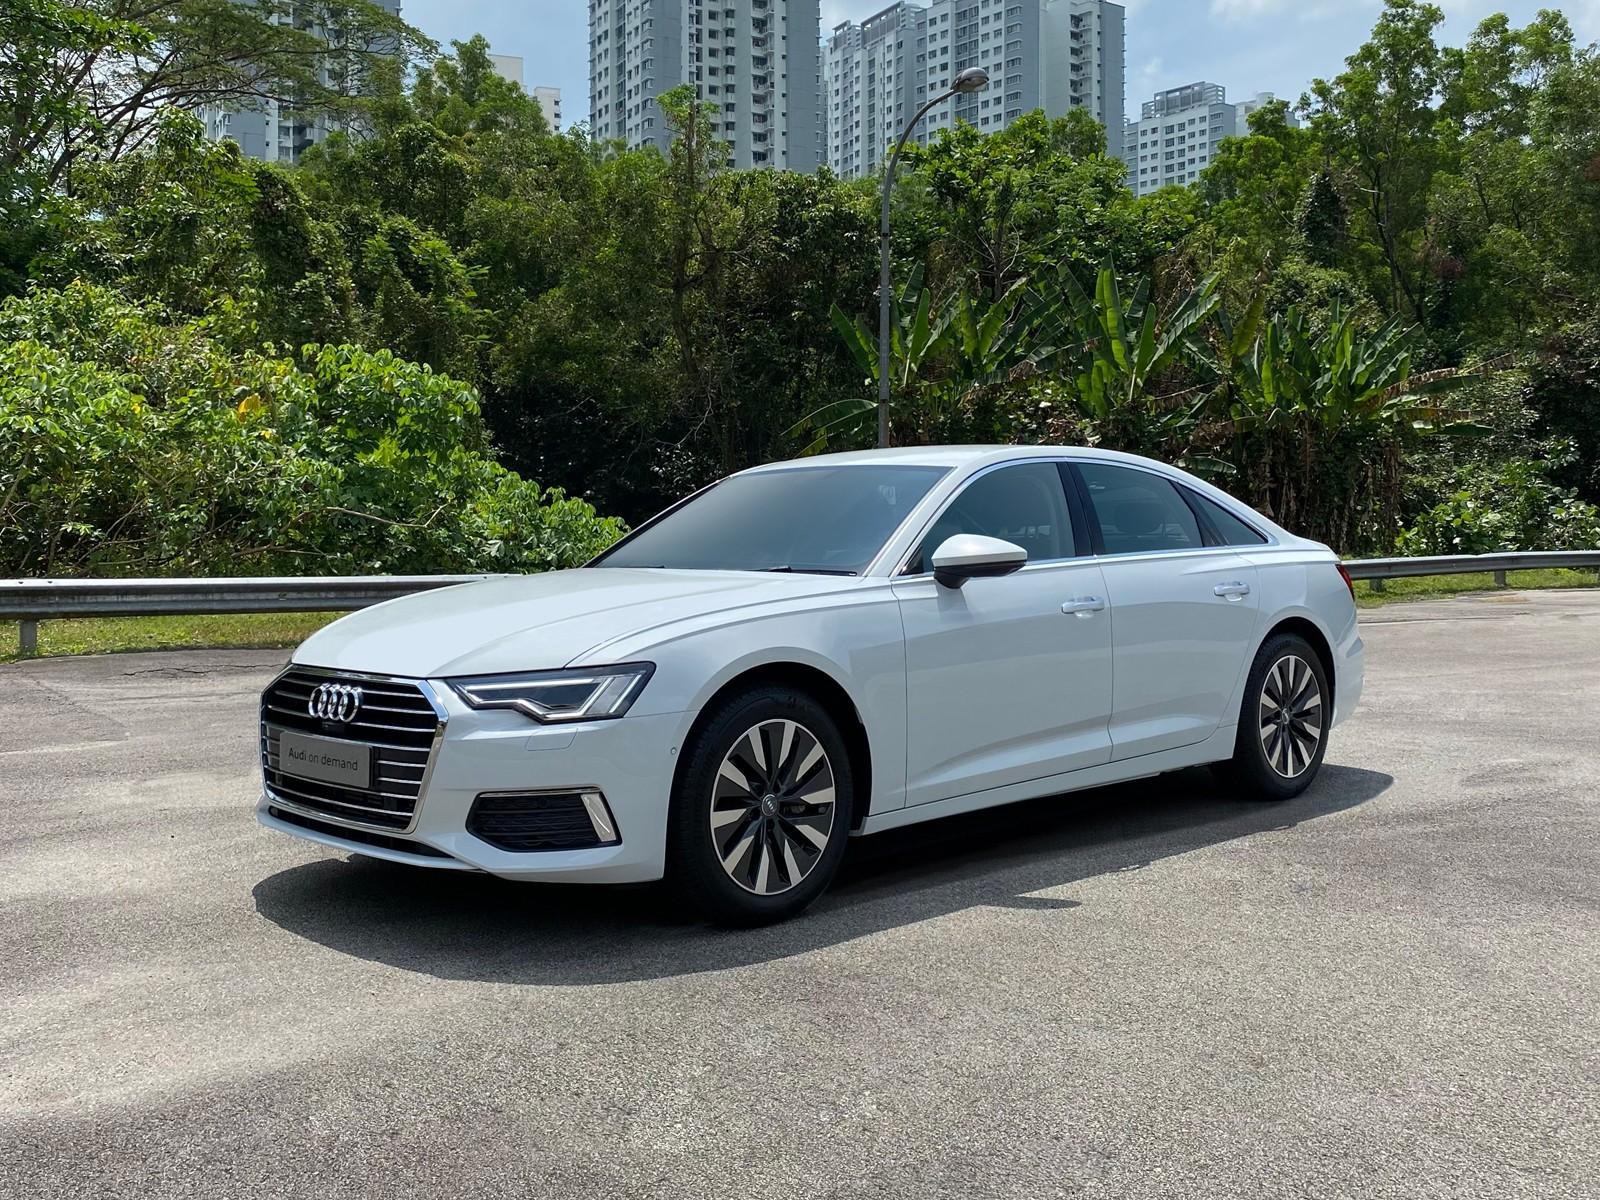 Audi A6 Sedan 2.0 TFSI S tronic (For Rent)